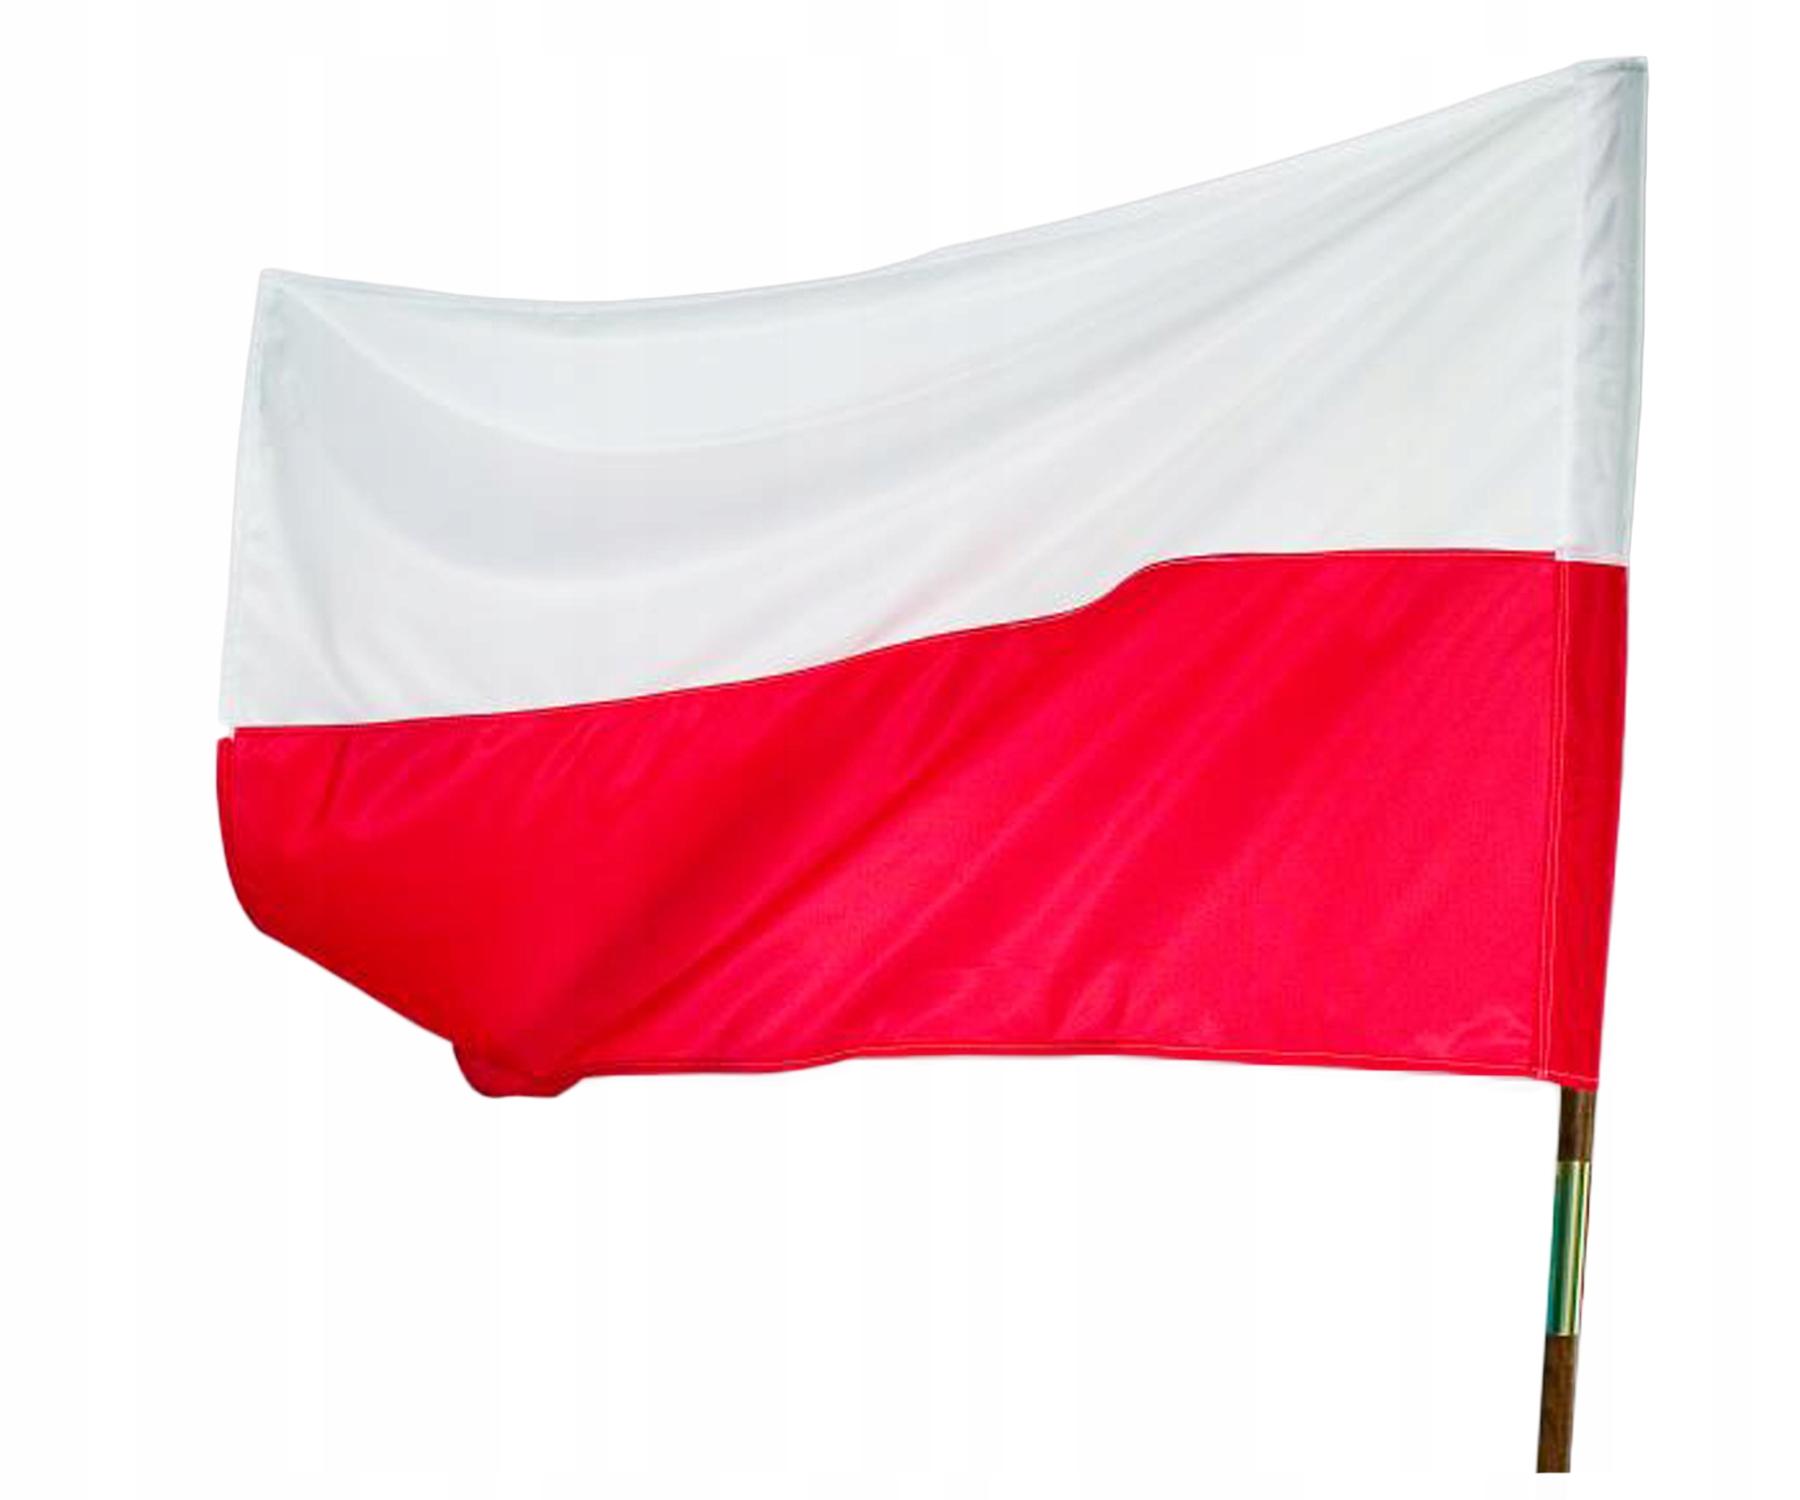 FLAGA FLAGI POLSKA POLSKI NARODOWA 150x92cm TEXICO